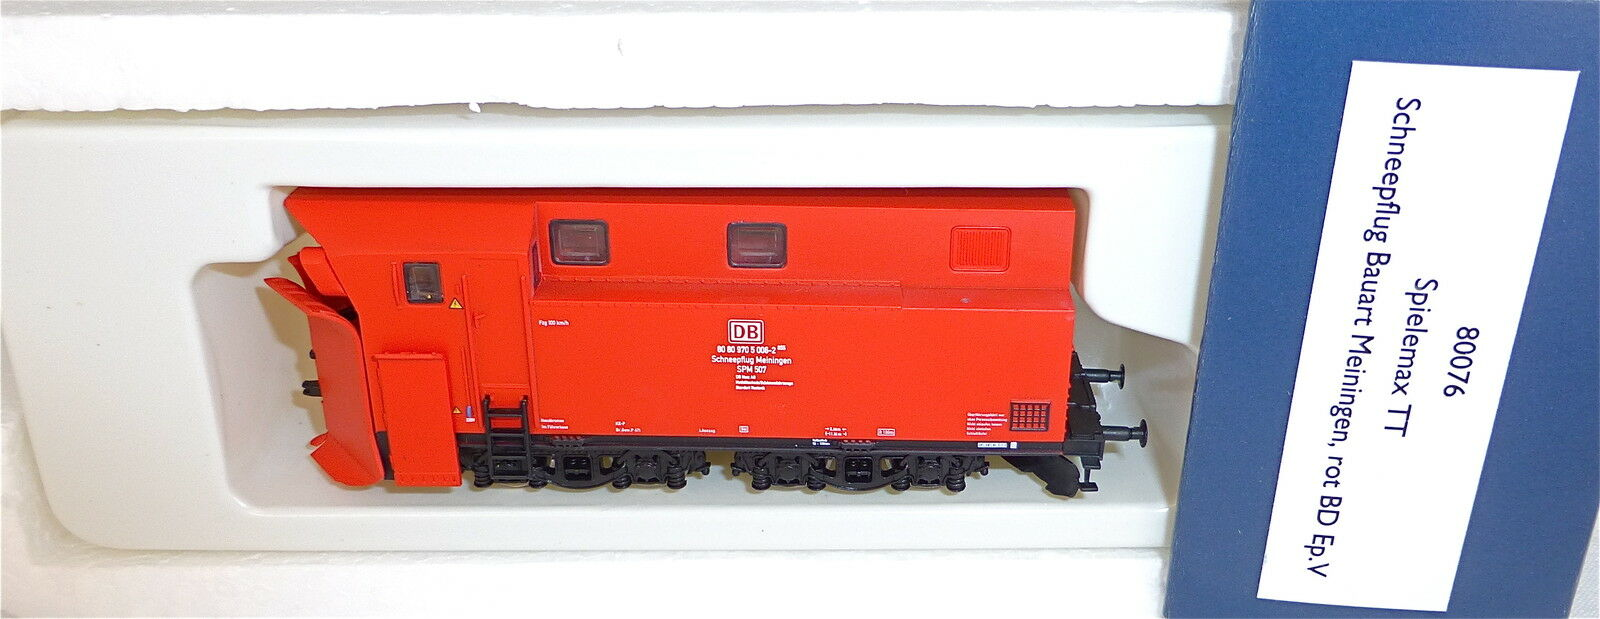 SPAZZANEVE tipo misurazioni senza semaforo rosso DB ep5 HERIS 80076 TT 1:120 hl2 Å *